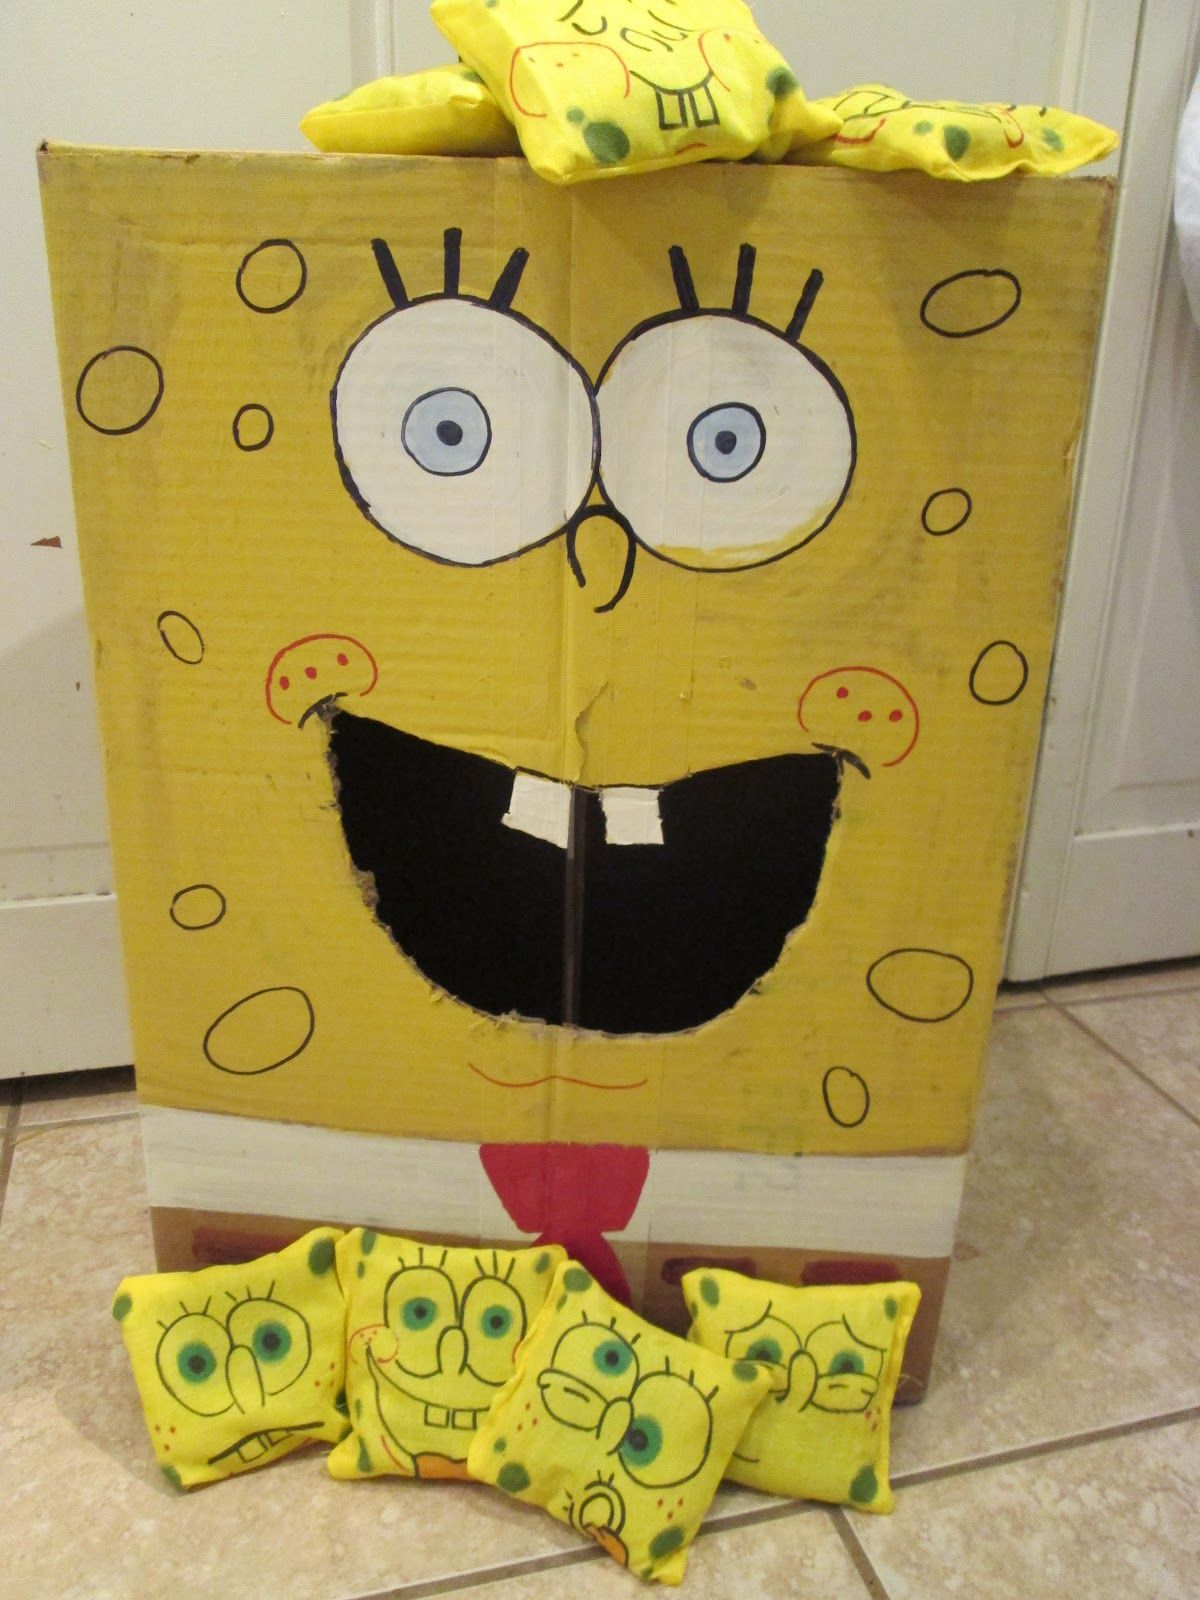 walk in the sunshine Spongebob Squarepants Bean Bag Toss